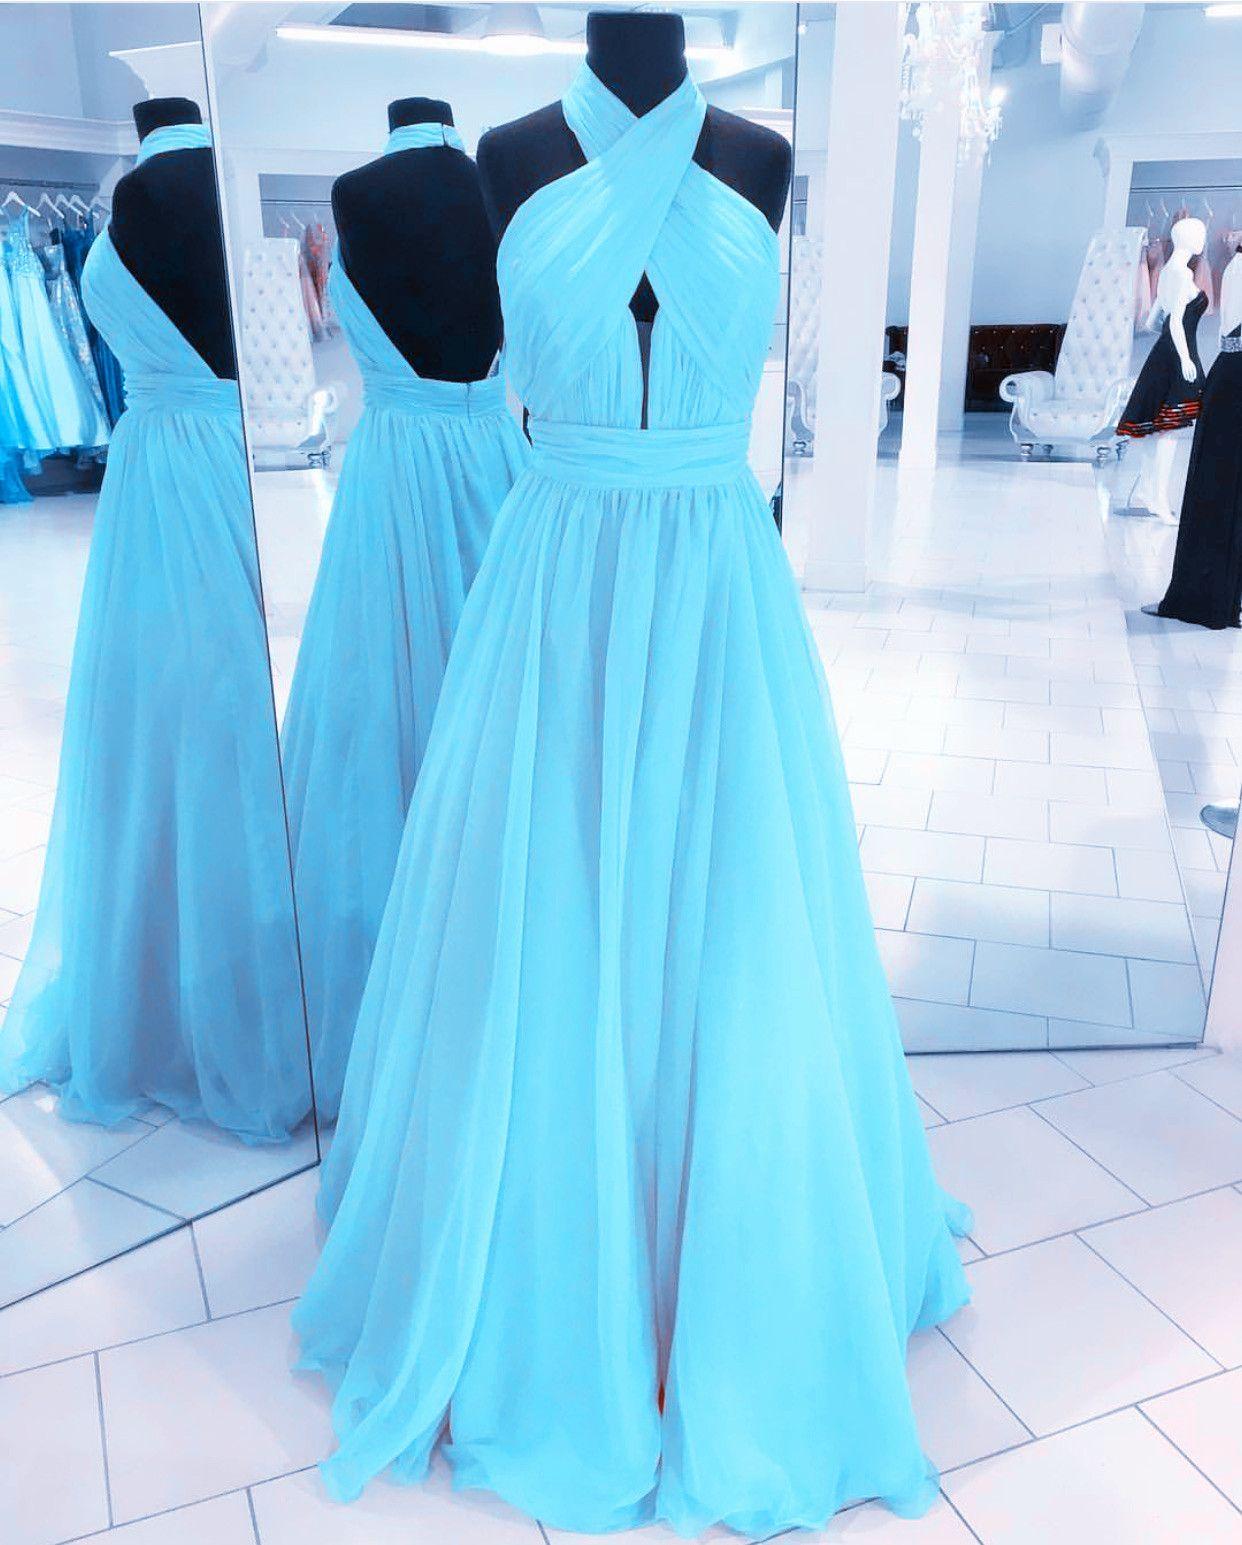 Halter Chiffon Open Back Evening Dresses Floor Length Prom Gowns ... 51f06bd2eccc